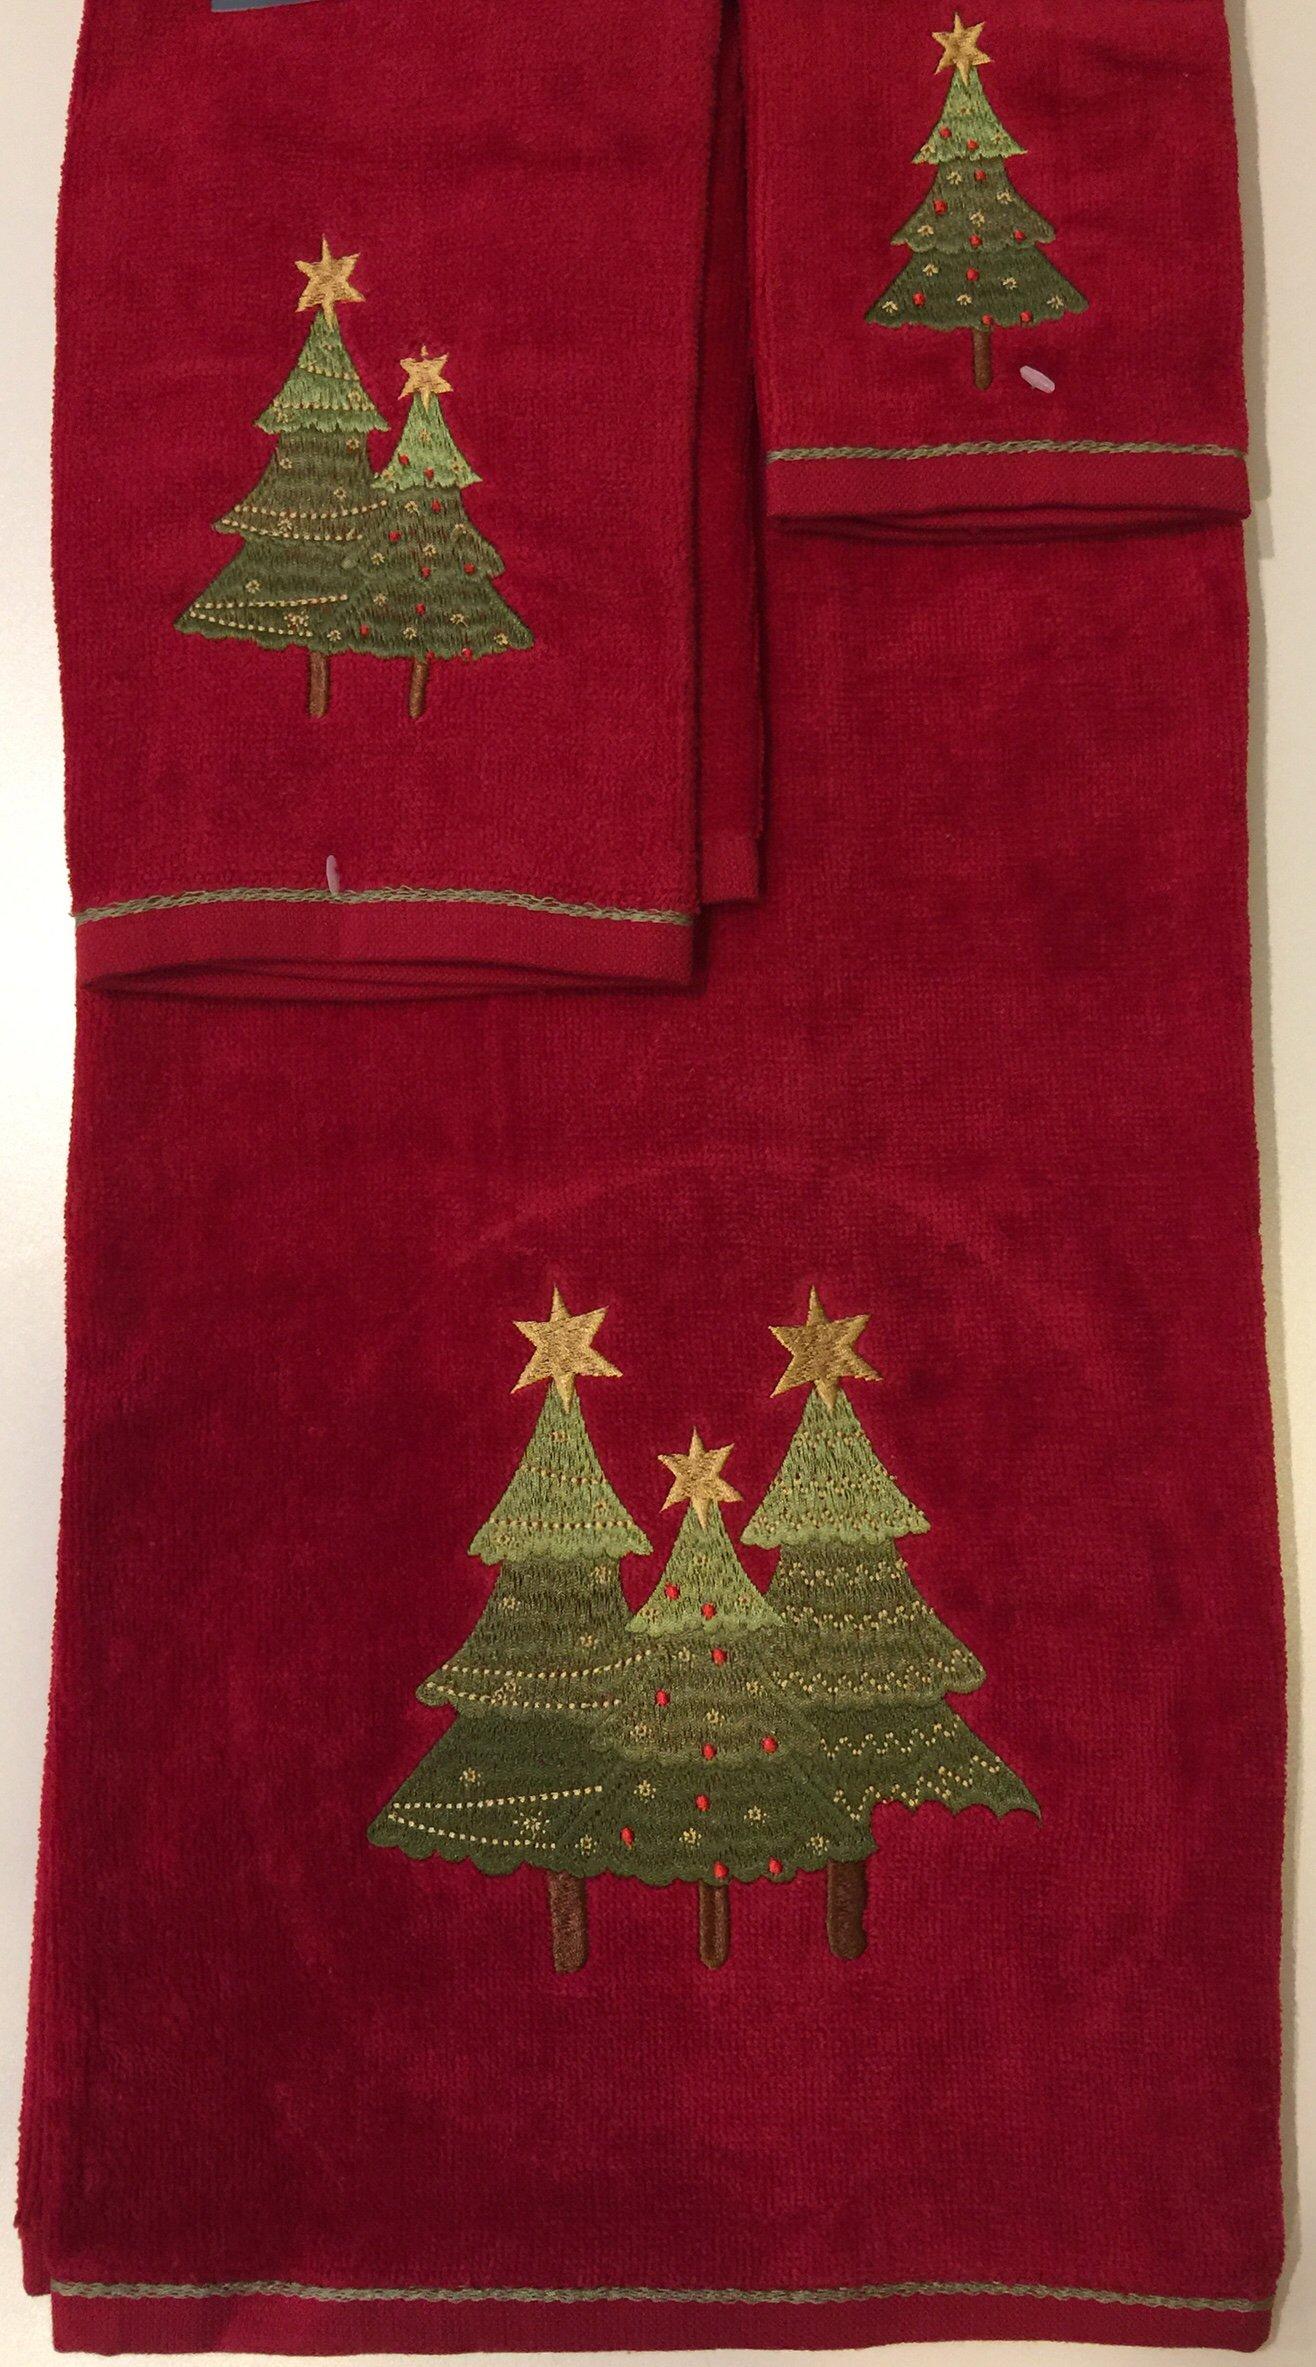 Christmas 3 Piece 100% Cotton Towel Set - Christmas Tree ( 6 Patterns, Great Christmas Gift)